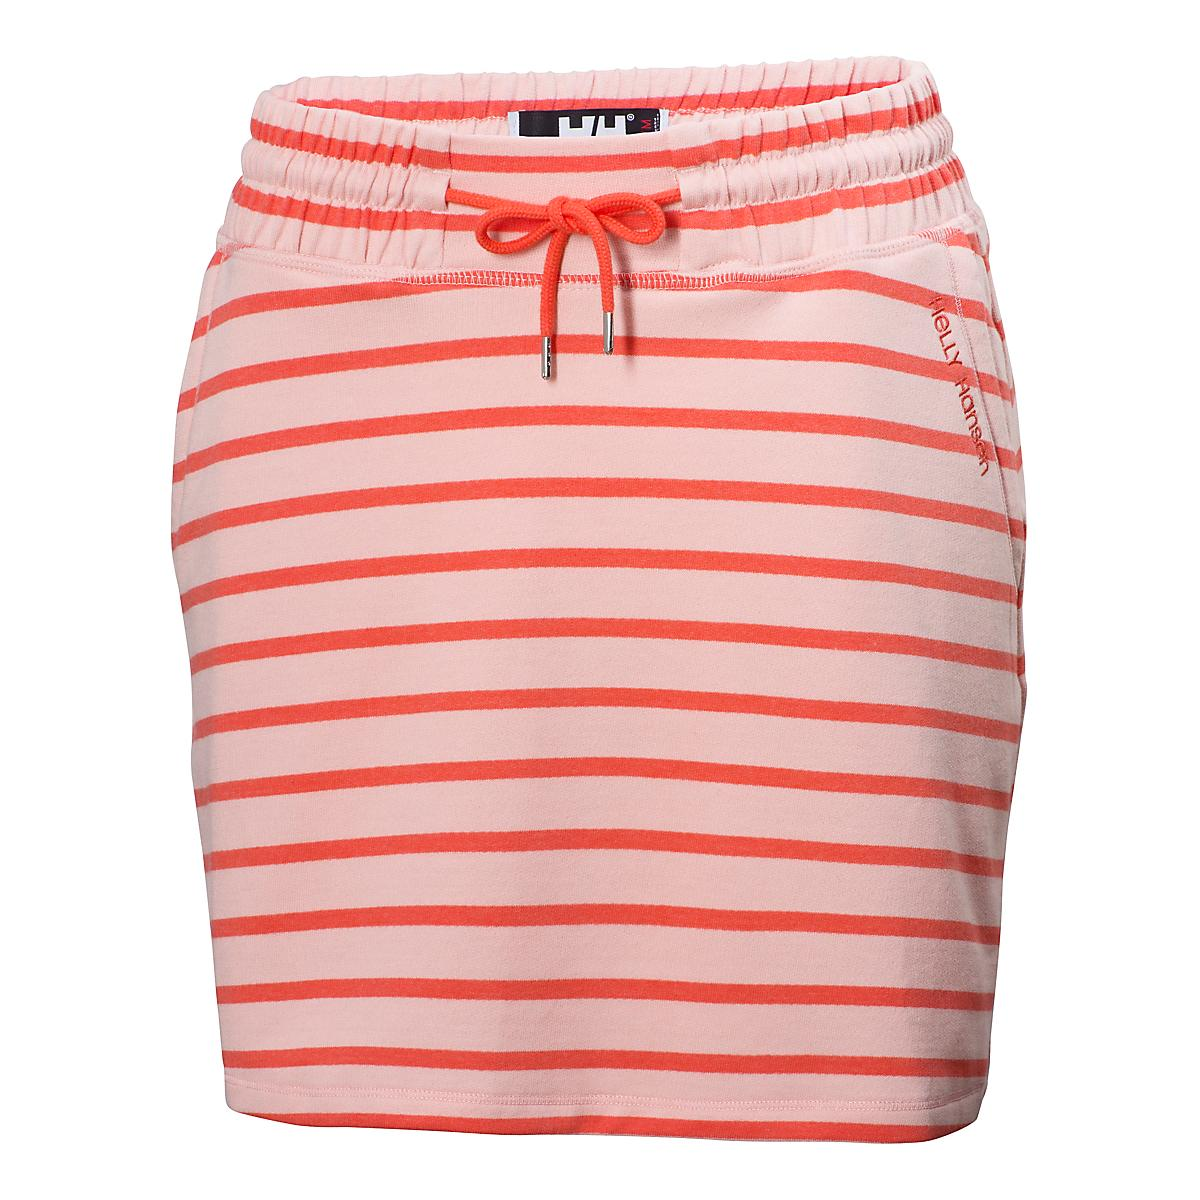 Women's Helly Hansen�Bliss Skirt